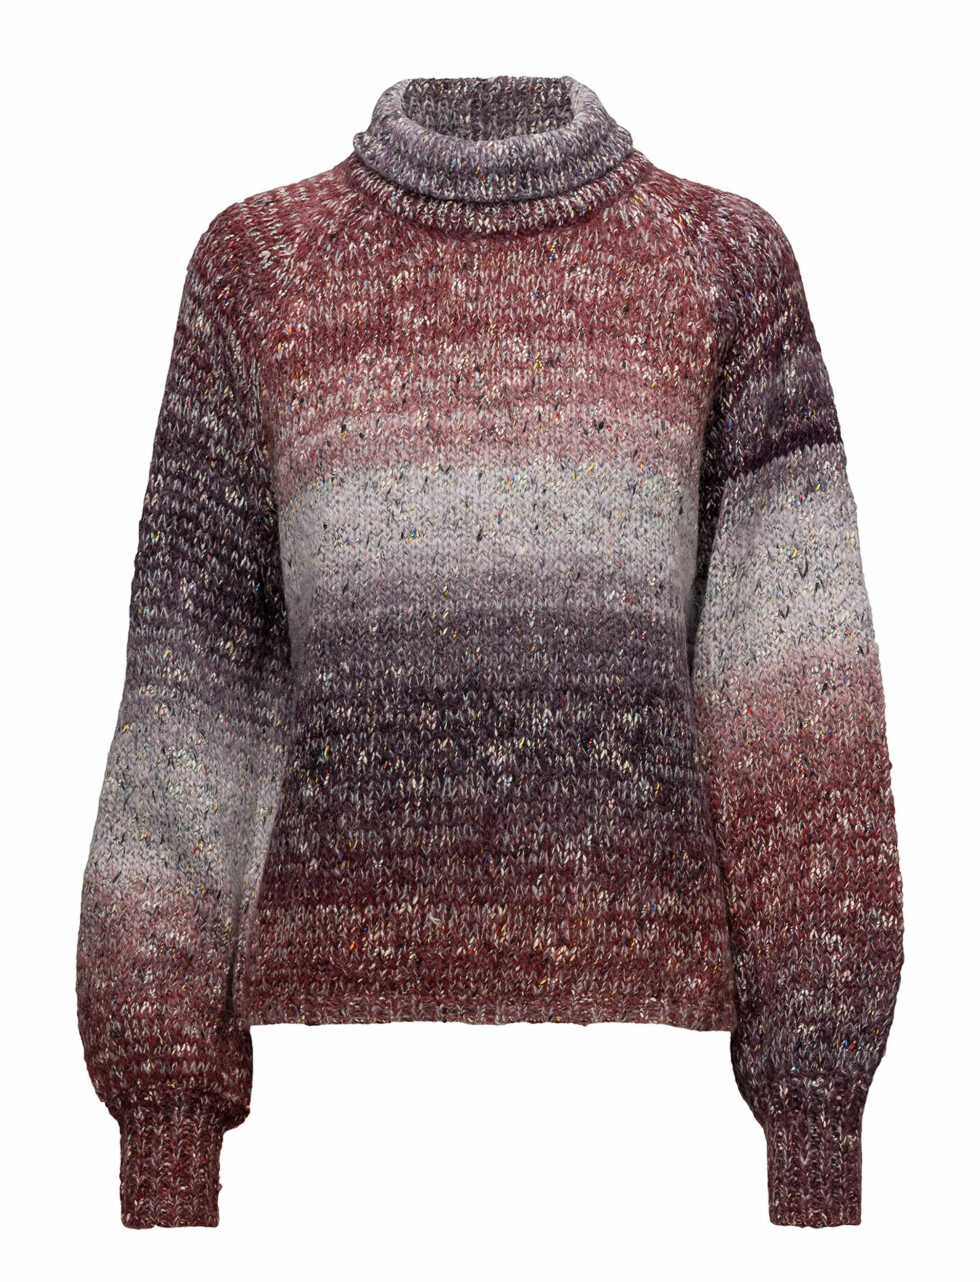 Genser fra Selected Femme  999,-  https://www.boozt.com/no/no/selected-femme/sfglitz-ls-knit-rollneck_16649193/16649197?navId=67396&group=listing&position=1000000